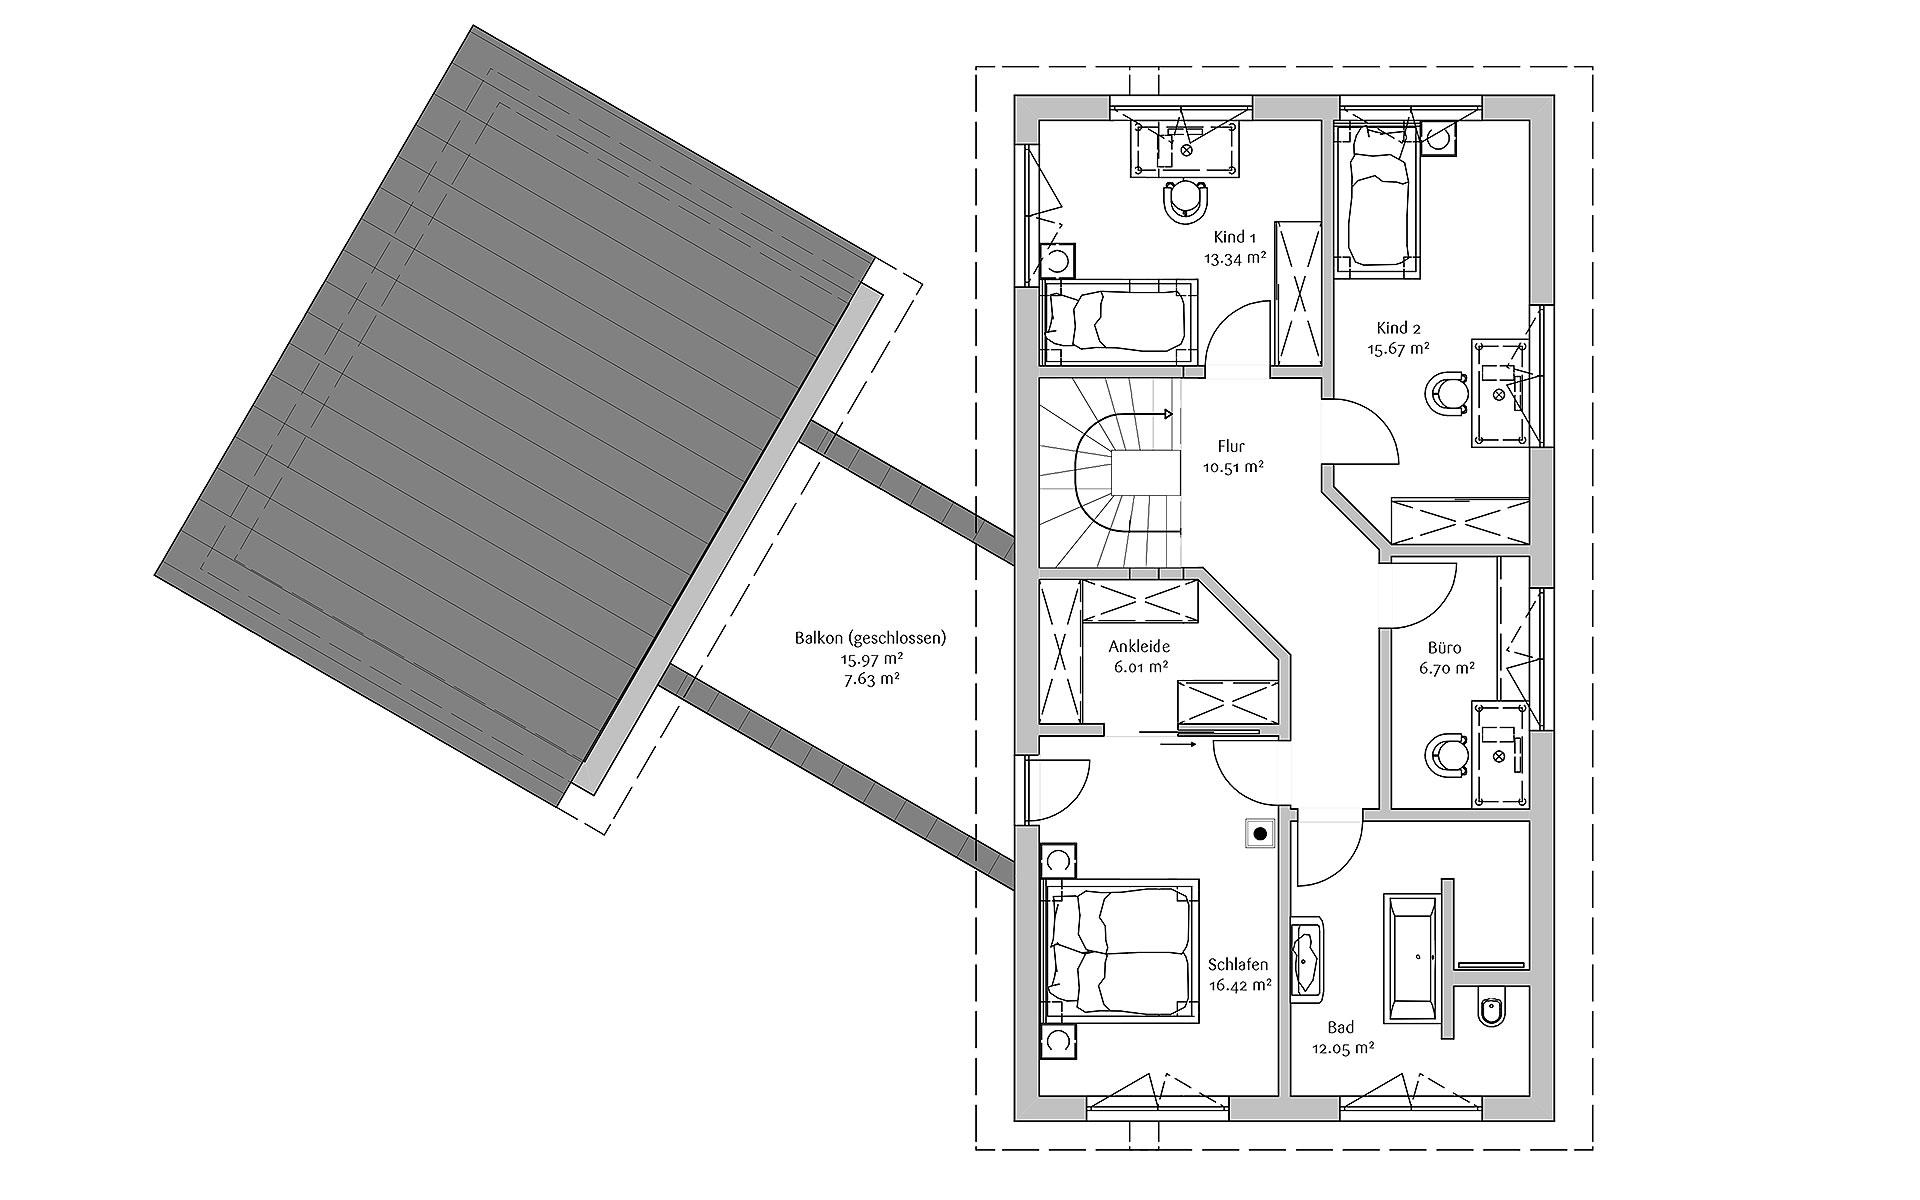 Obergeschoss Moden 240 von FischerHaus GmbH & Co. KG